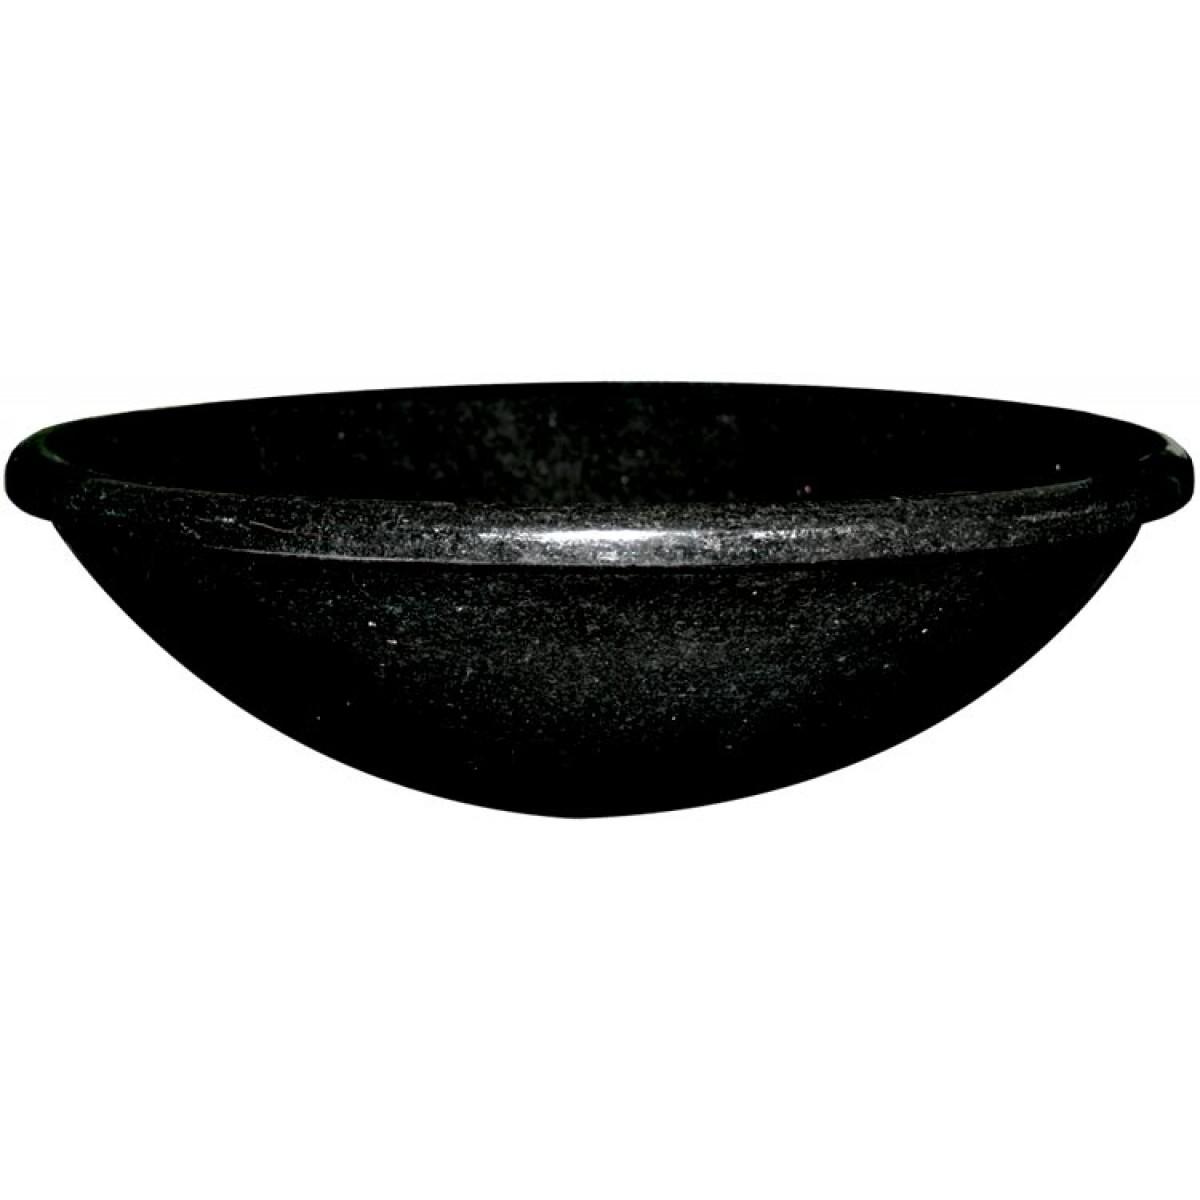 Black galaxy granite stone undermount drop in countertop bathroom lavatory vessel sink 17 for Black granite vessel bathroom sinks